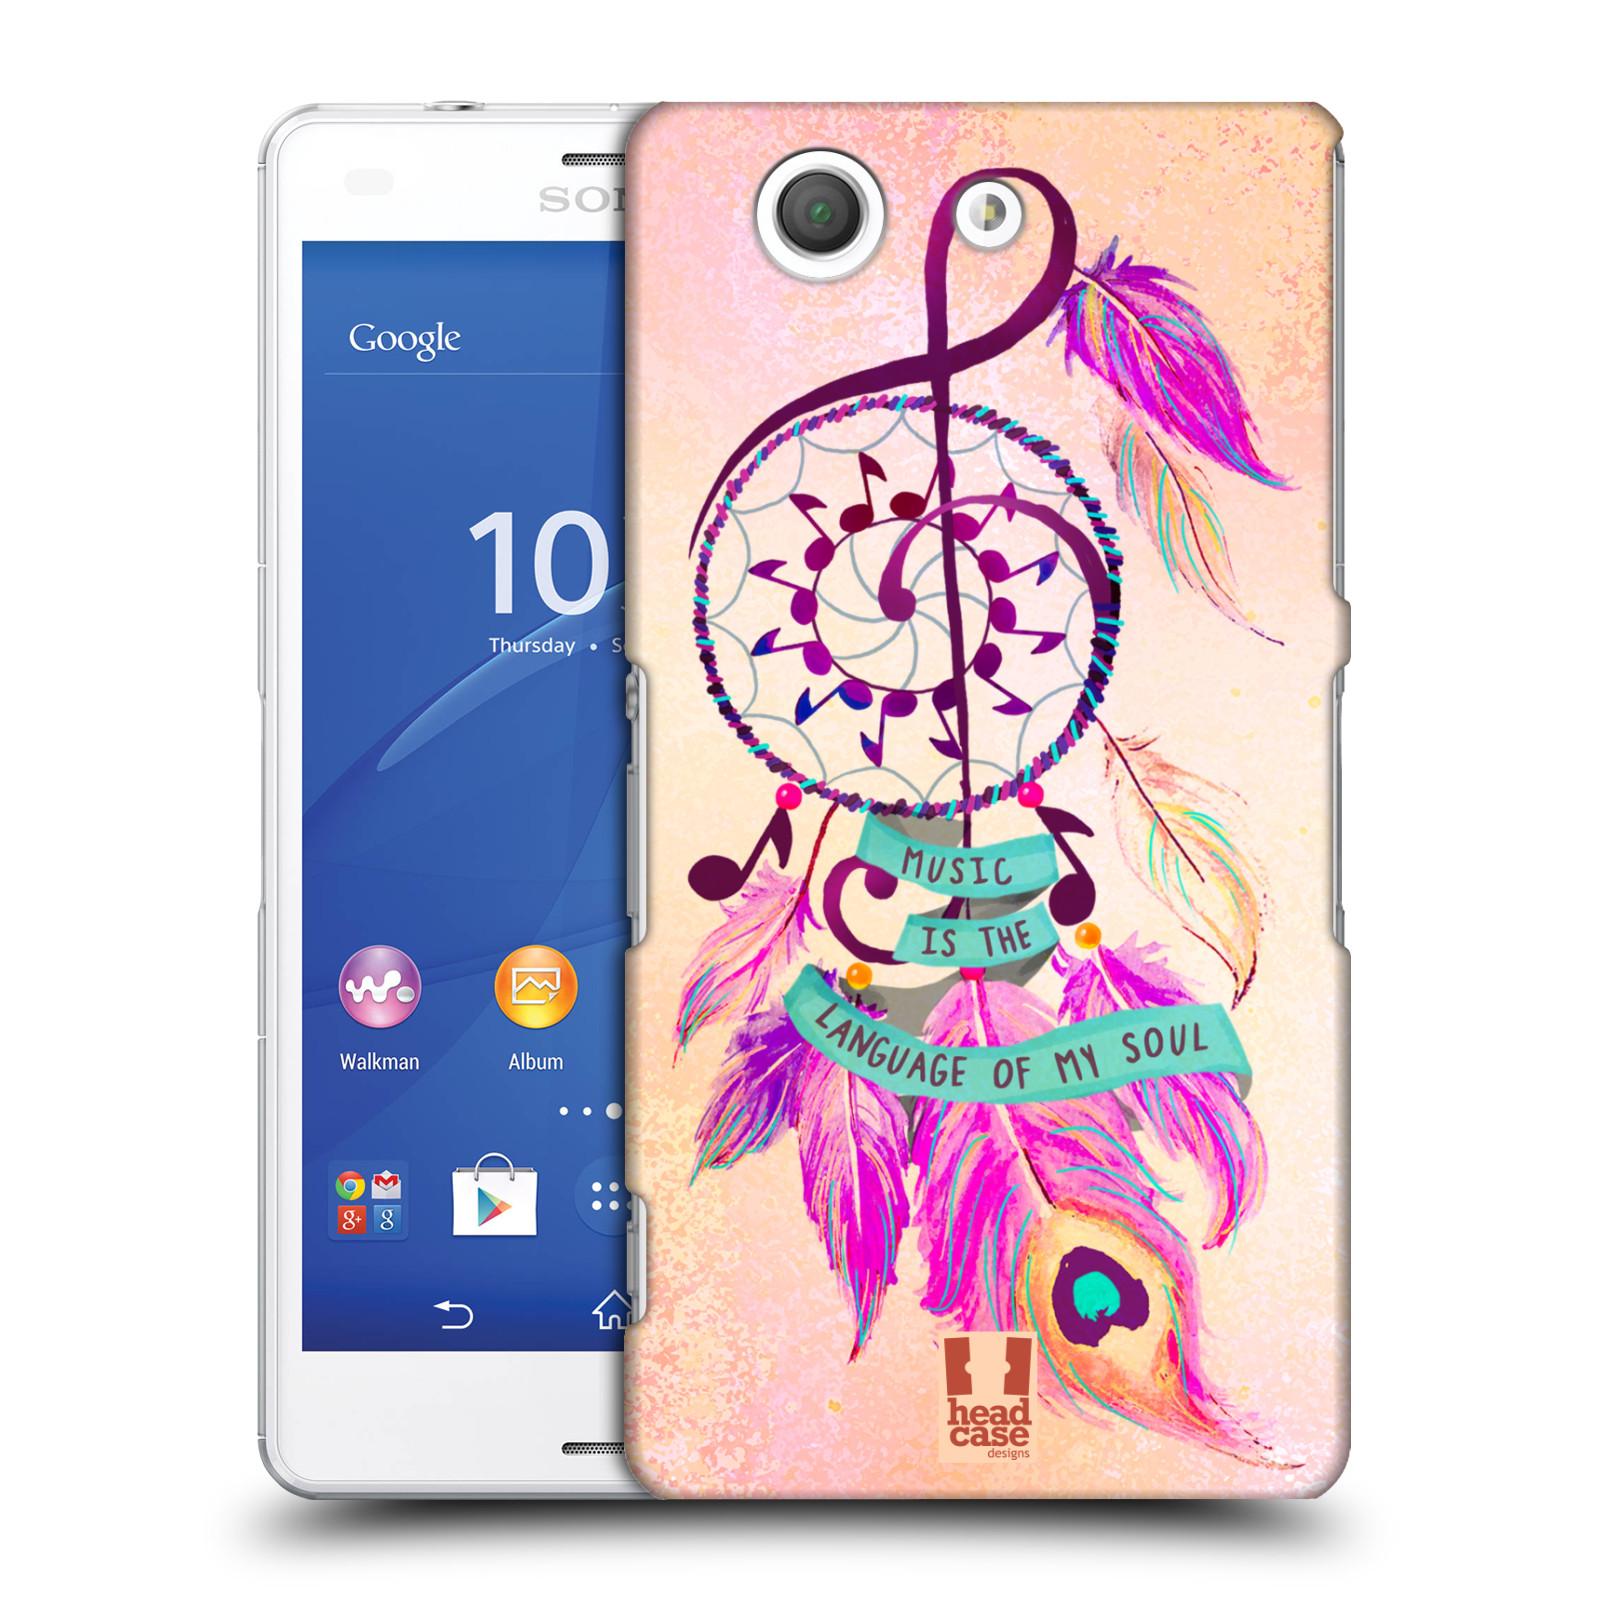 Plastové pouzdro na mobil Sony Xperia Z3 Compact D5803 HEAD CASE Lapač Assorted Music